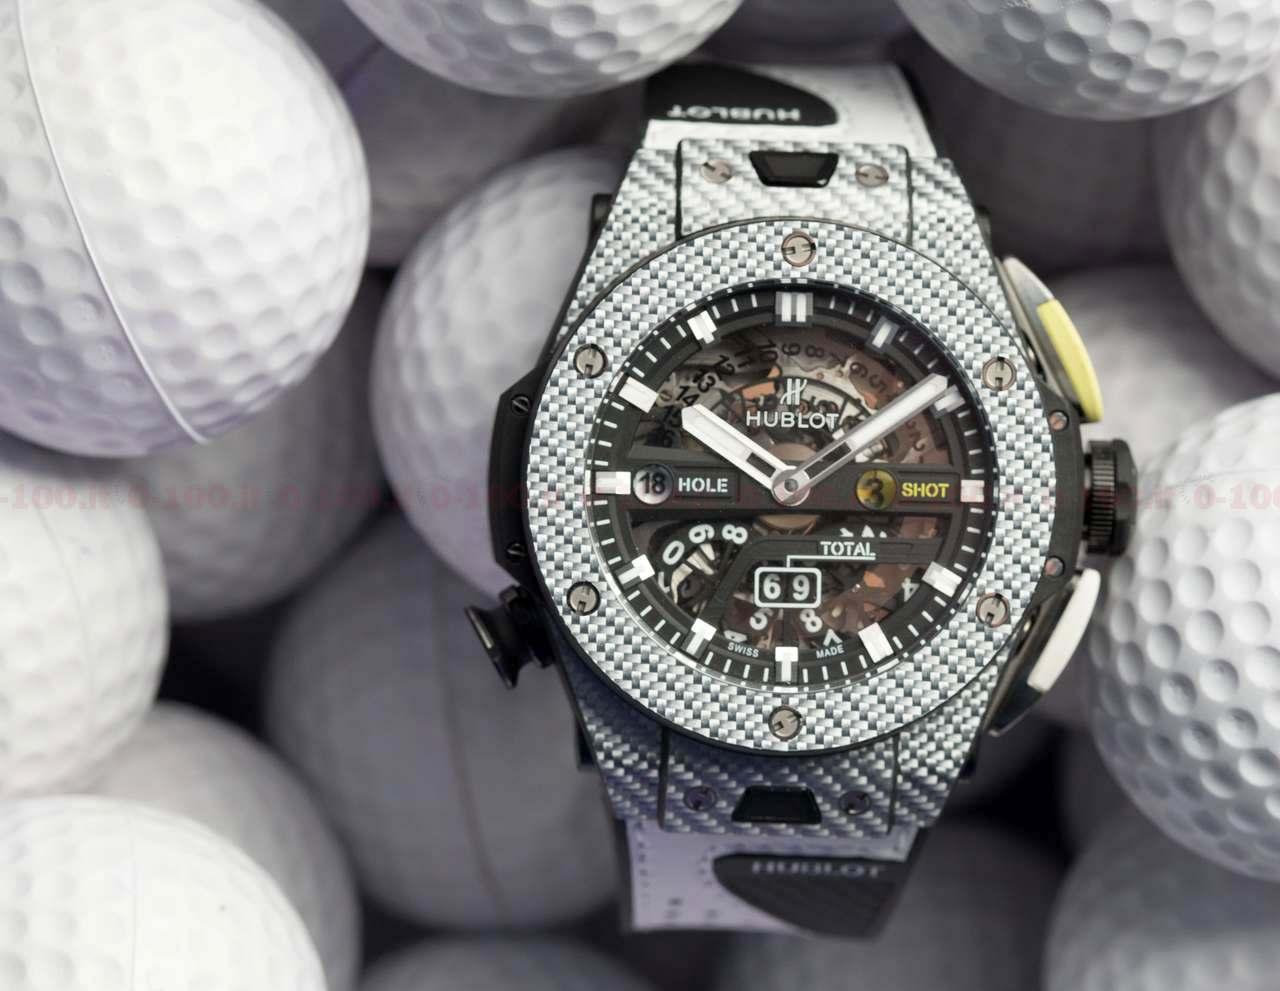 Hublot Big Bang Unico Golf Ref. 416.YS.1120.VR Dustin Johnson_0-100_price_0-1002